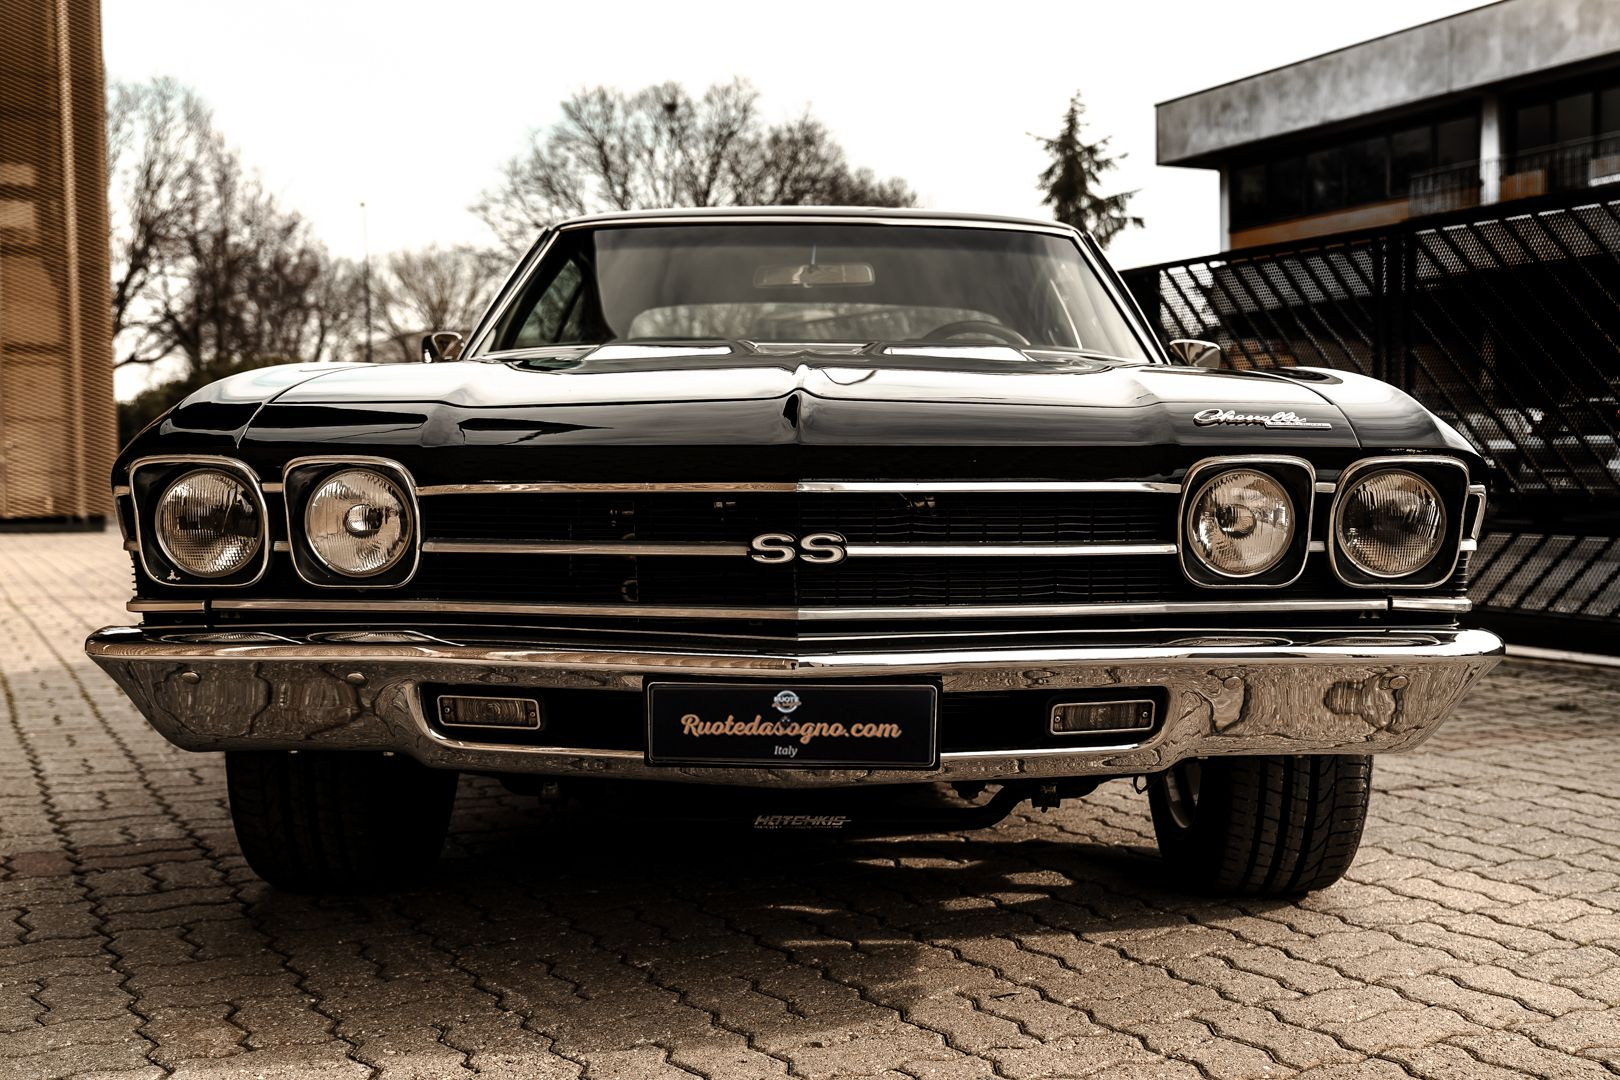 1969 Chevrolet Chevelle SS 62961